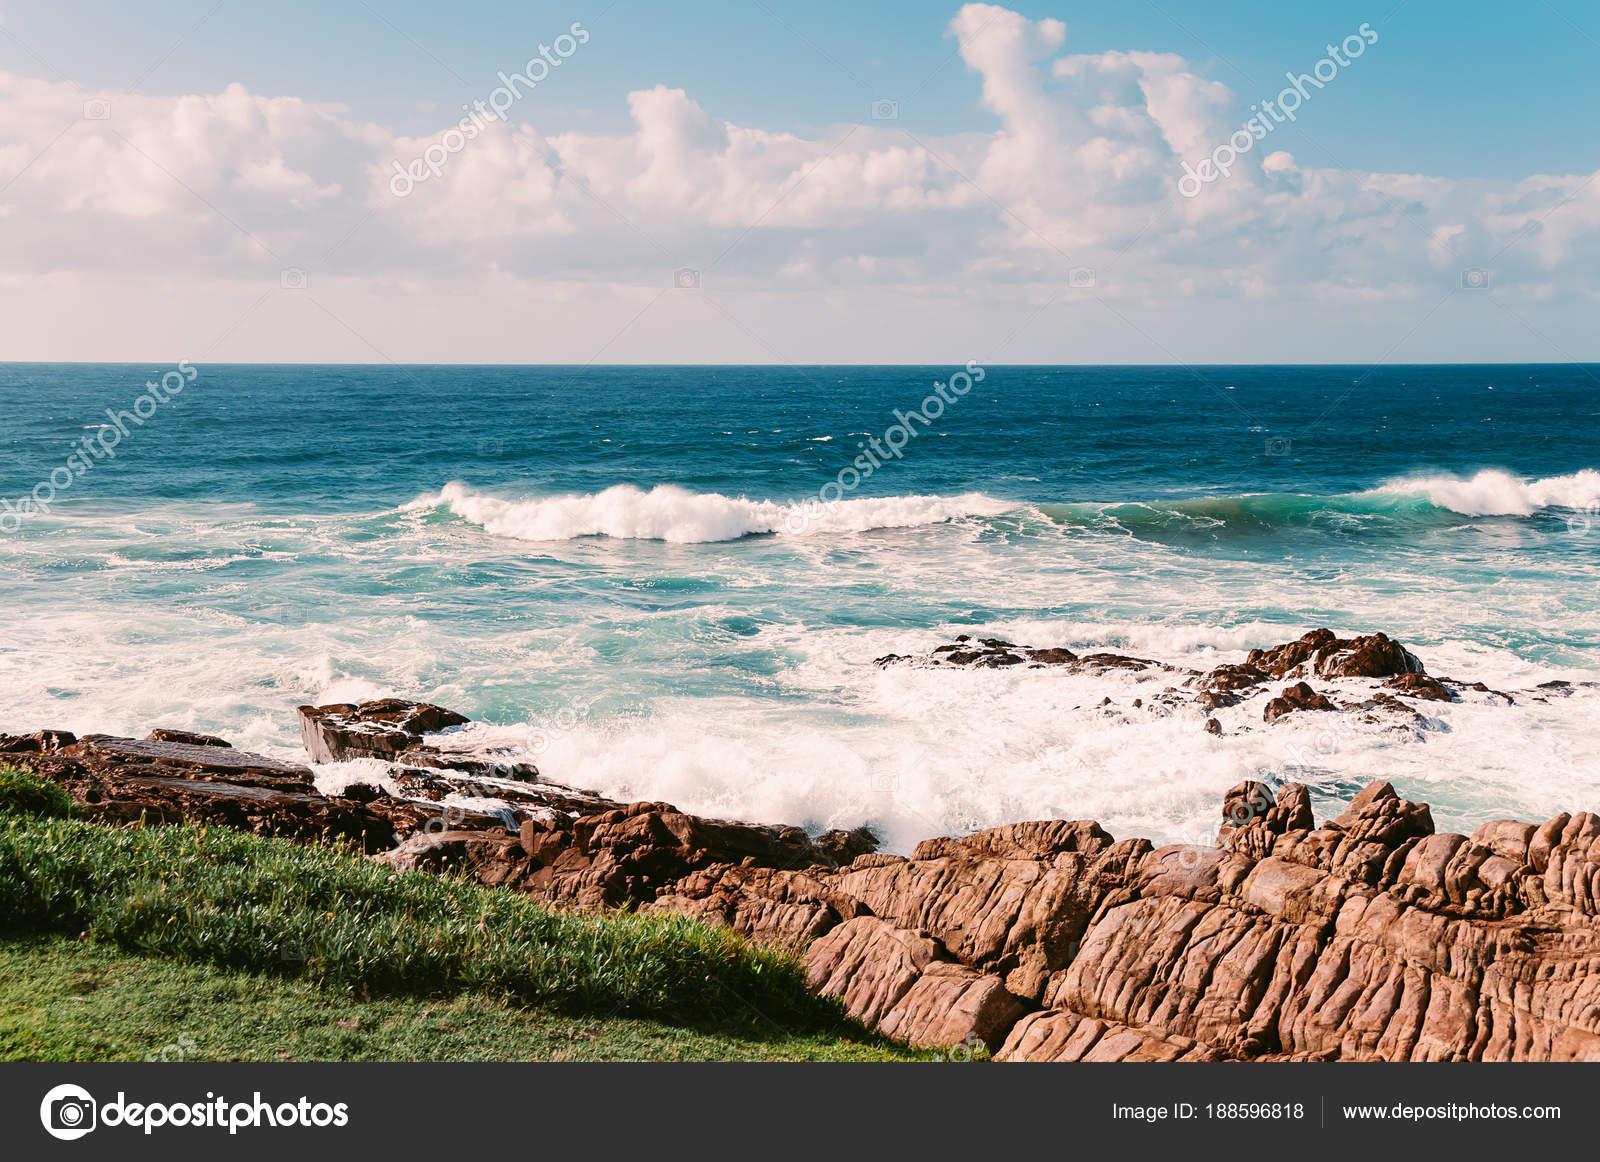 Ocean Beach Margate South Africa Blue Sky White Clouds